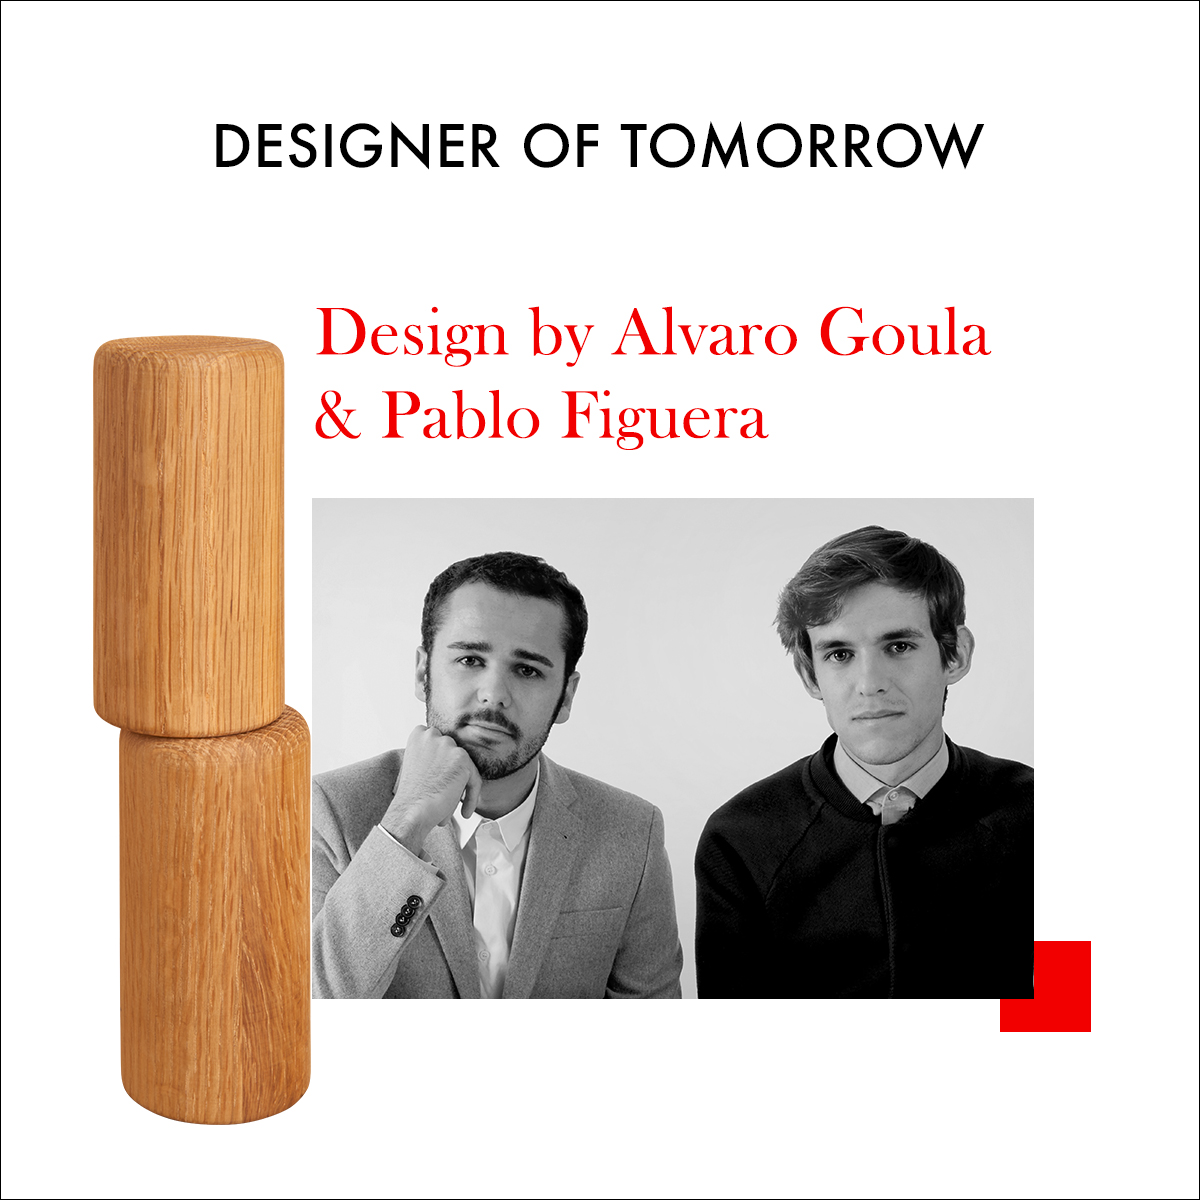 Alvaro Goula & Pablo Figuera